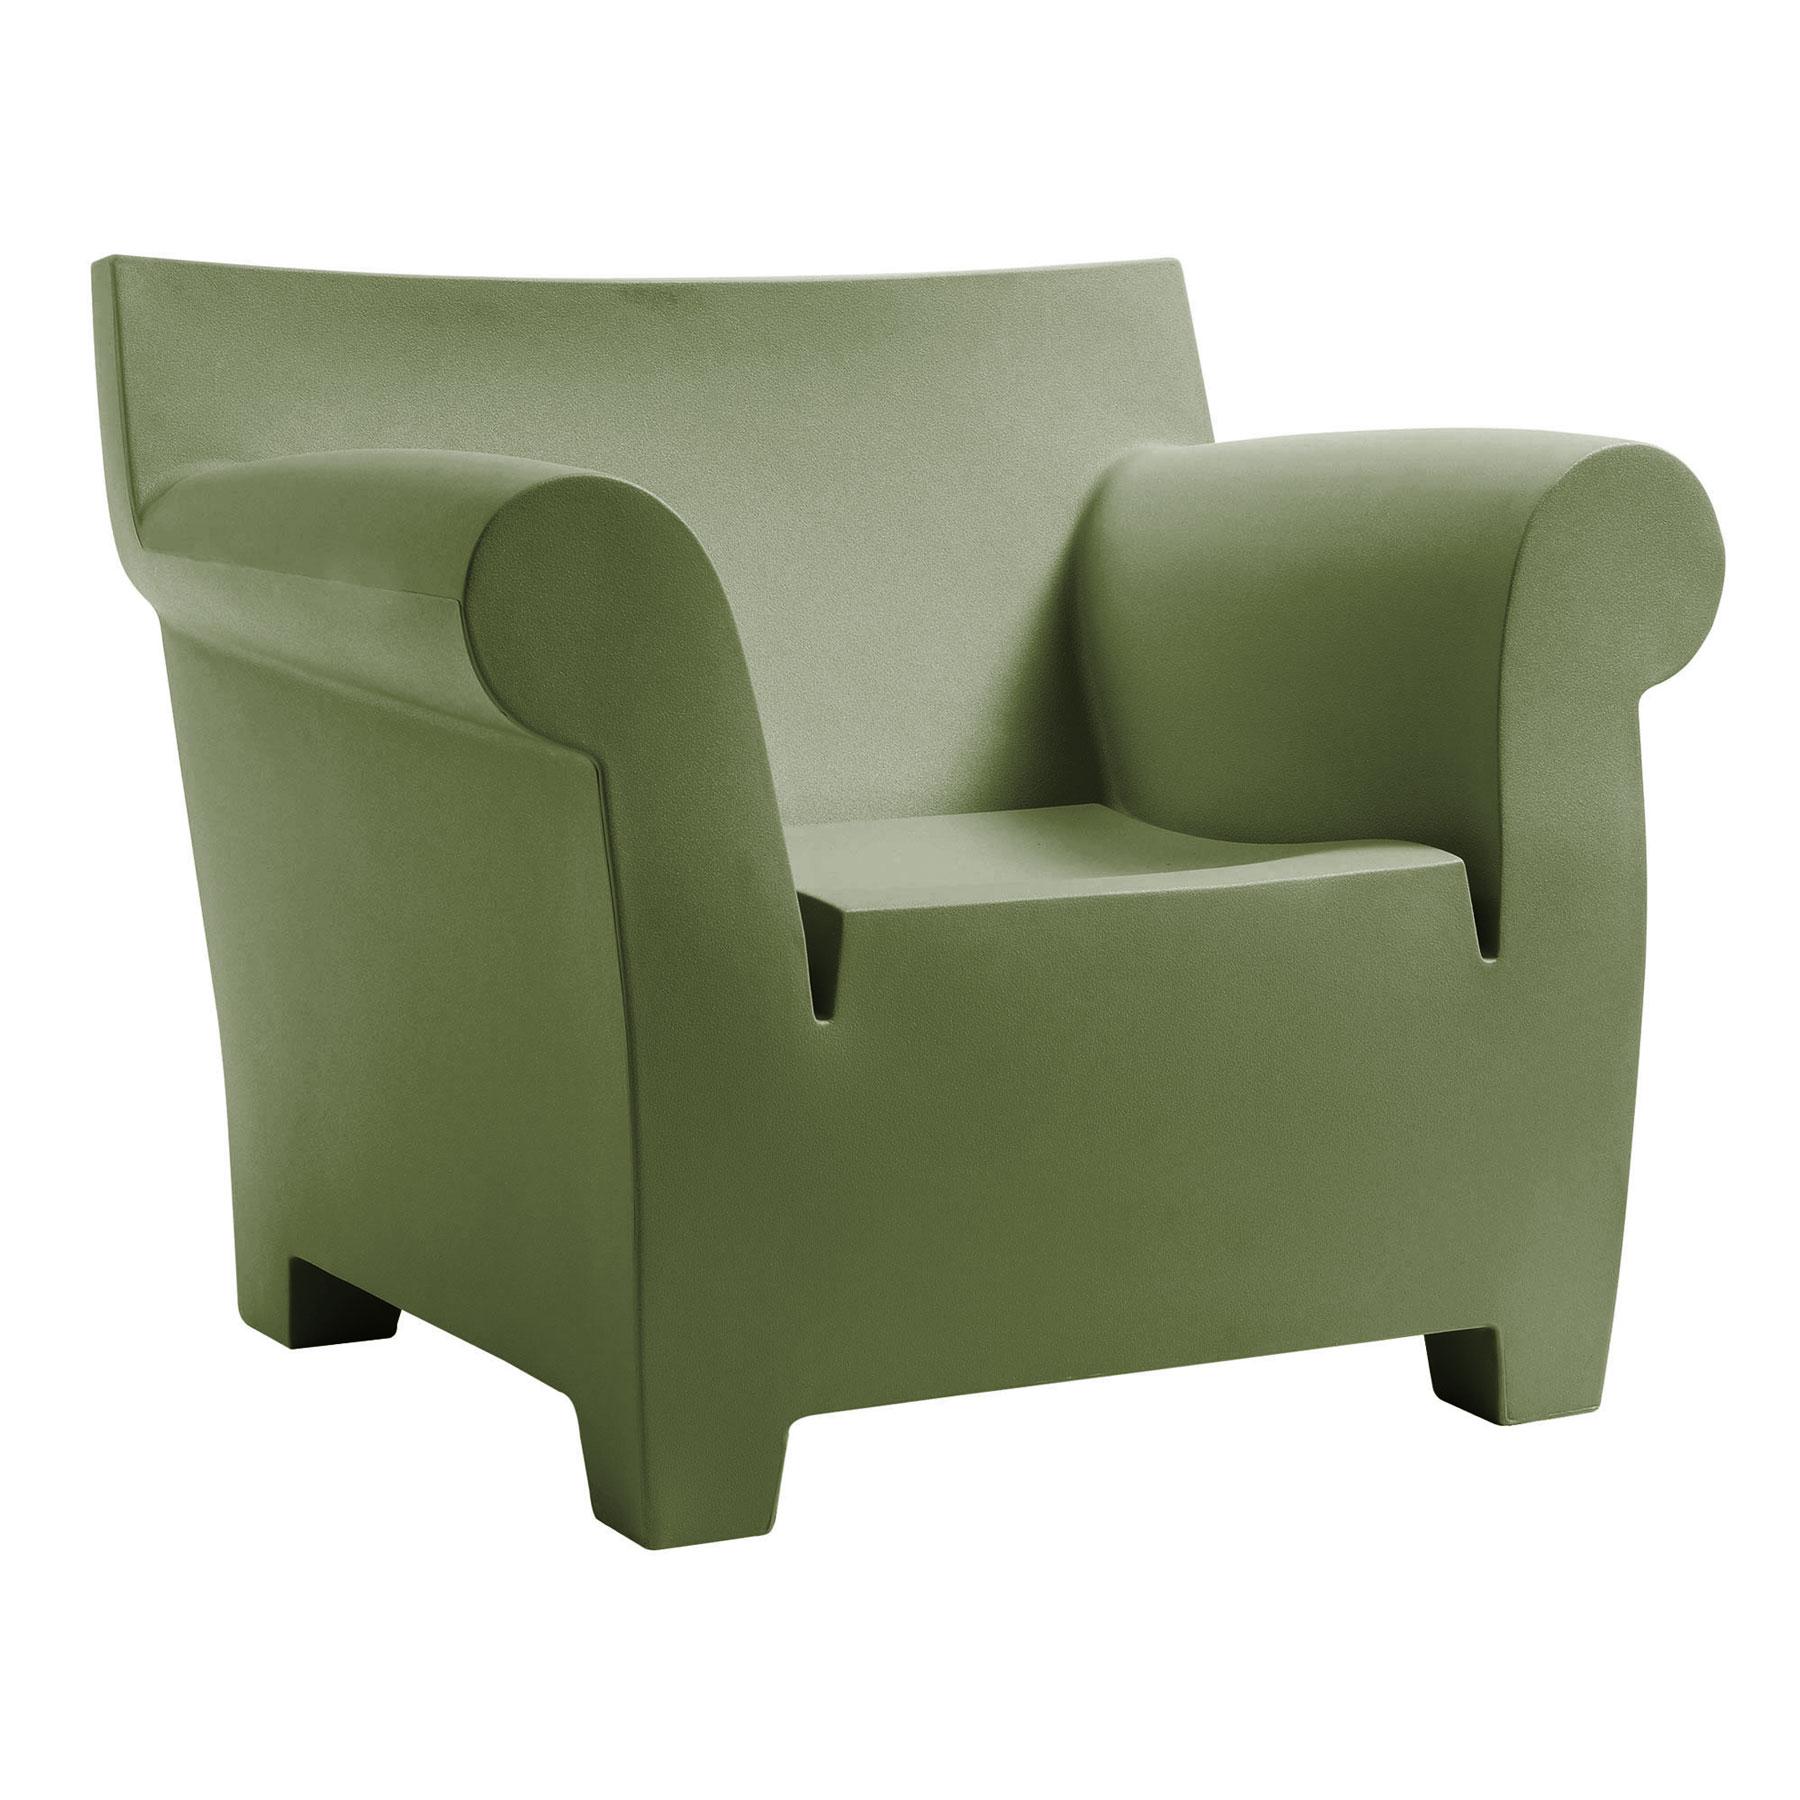 starck bubble sofa. Black Bedroom Furniture Sets. Home Design Ideas